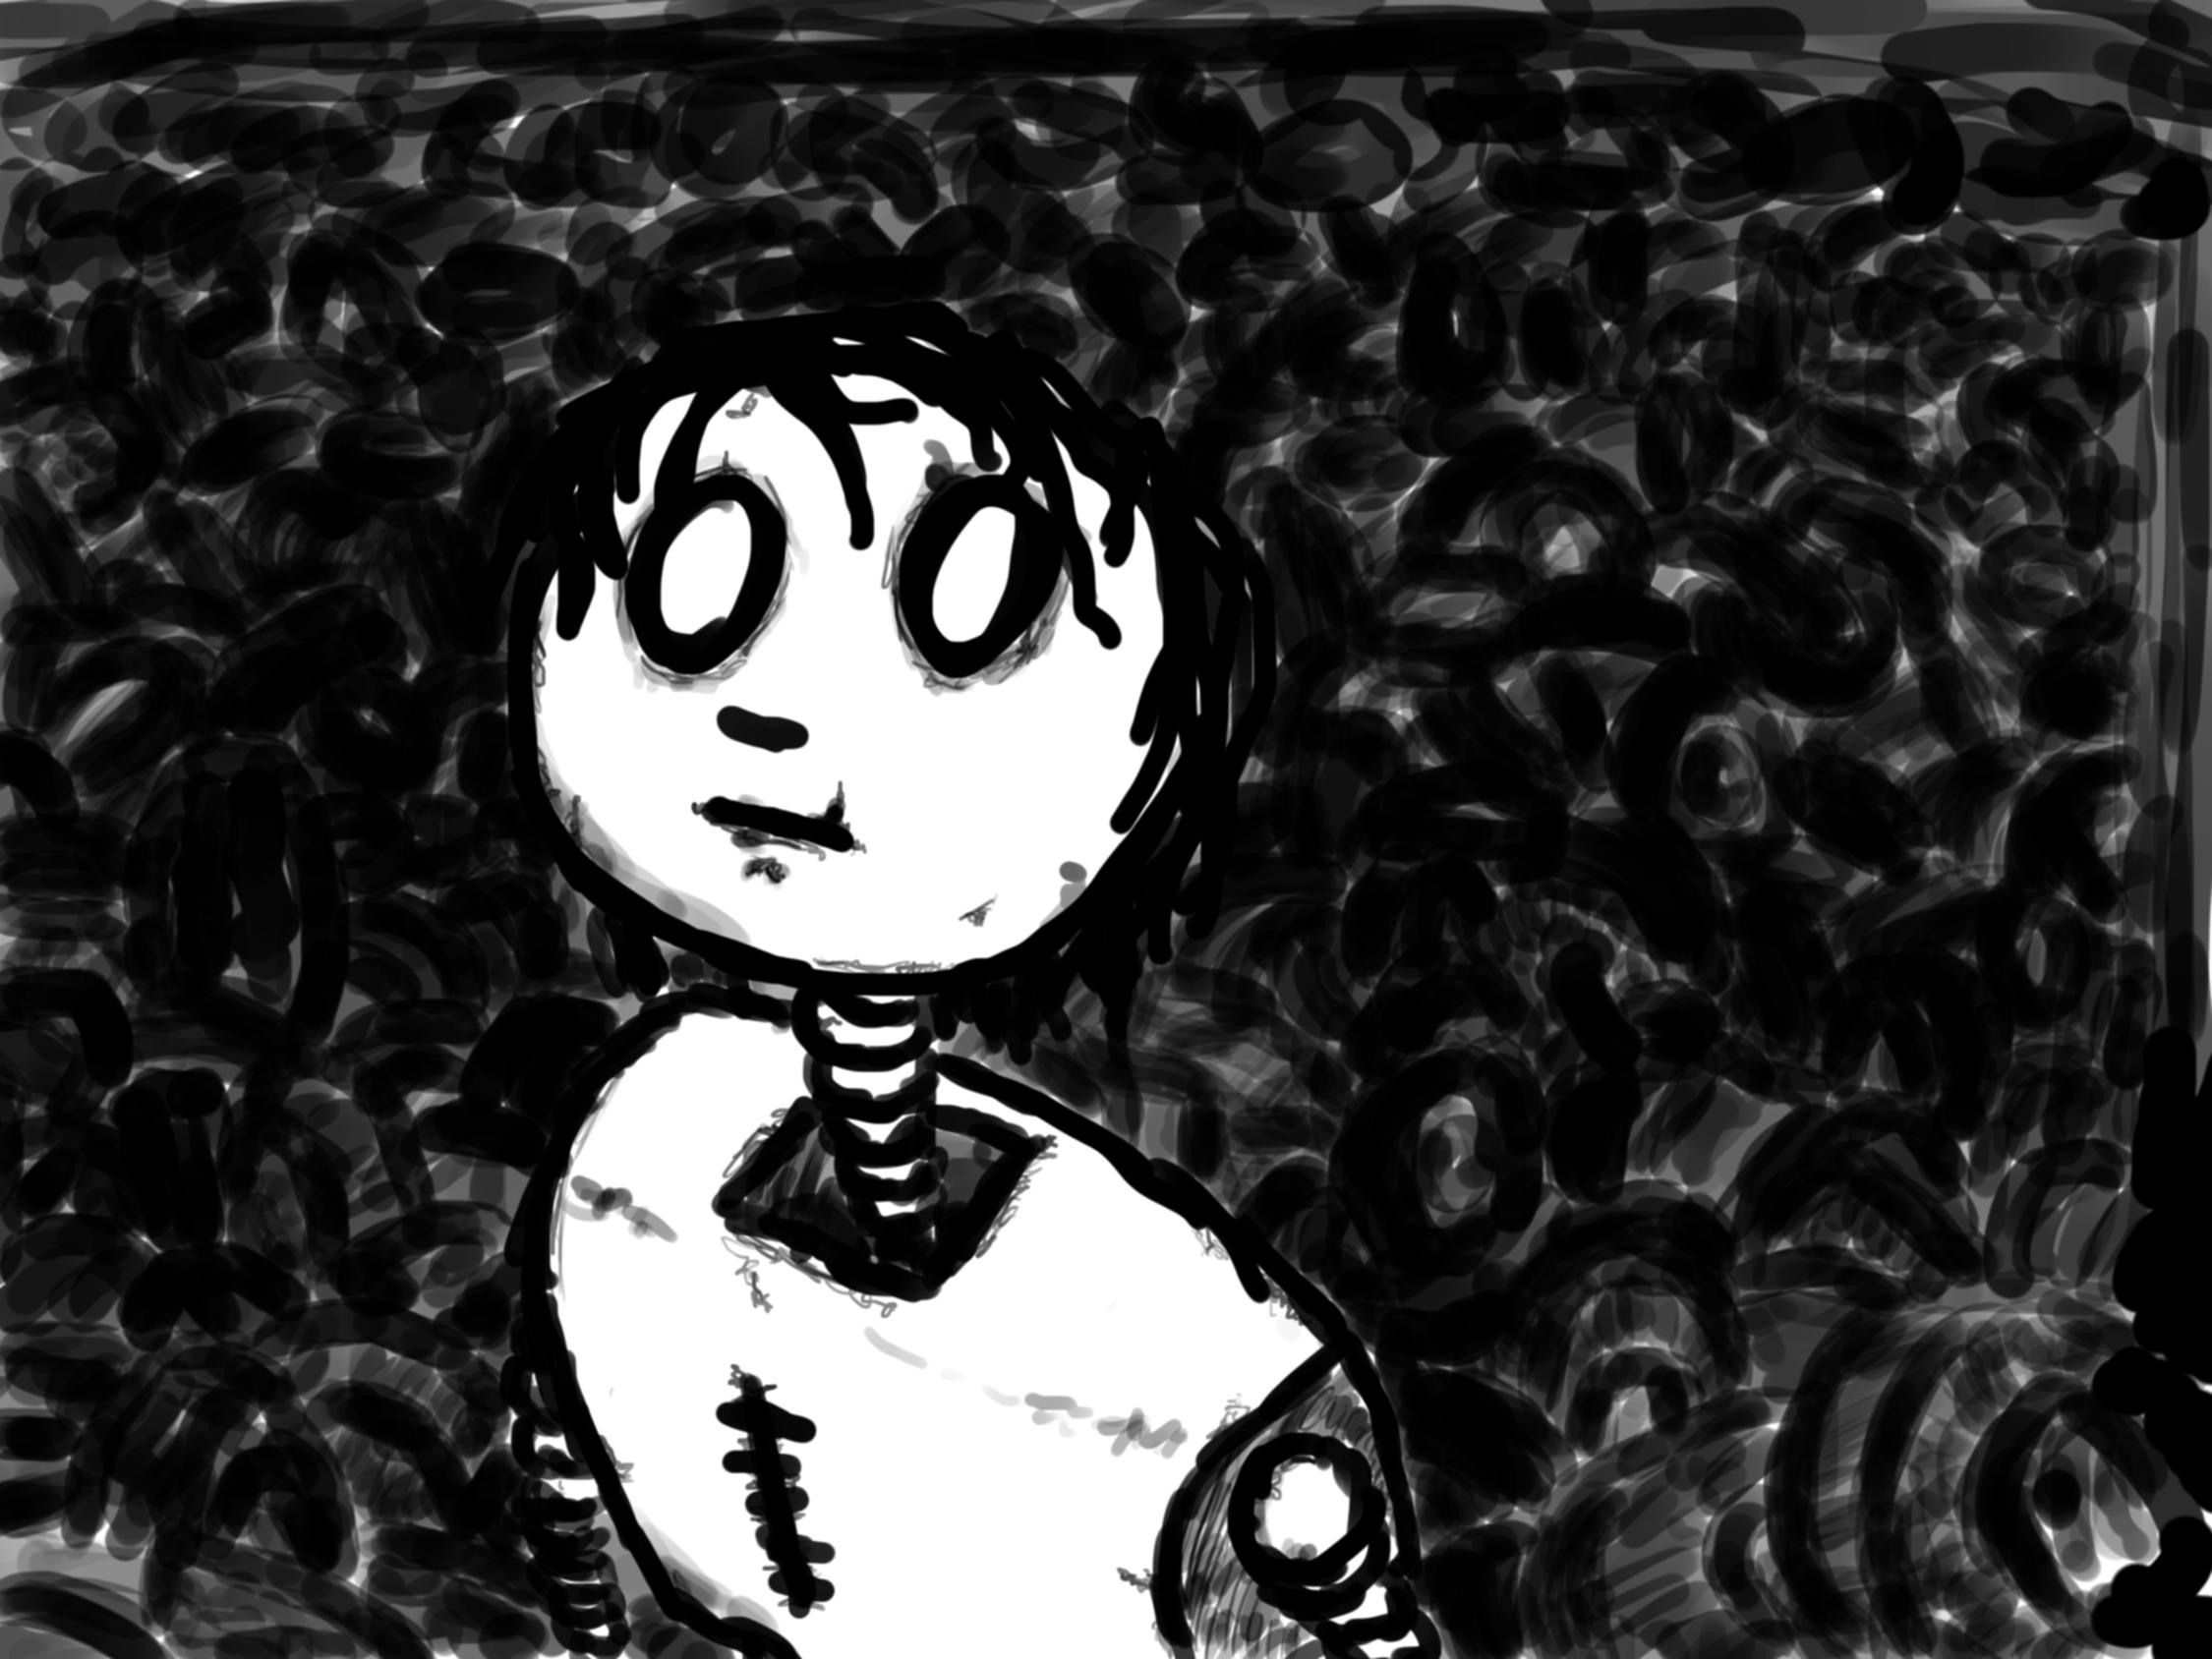 Yama the Scarecrow